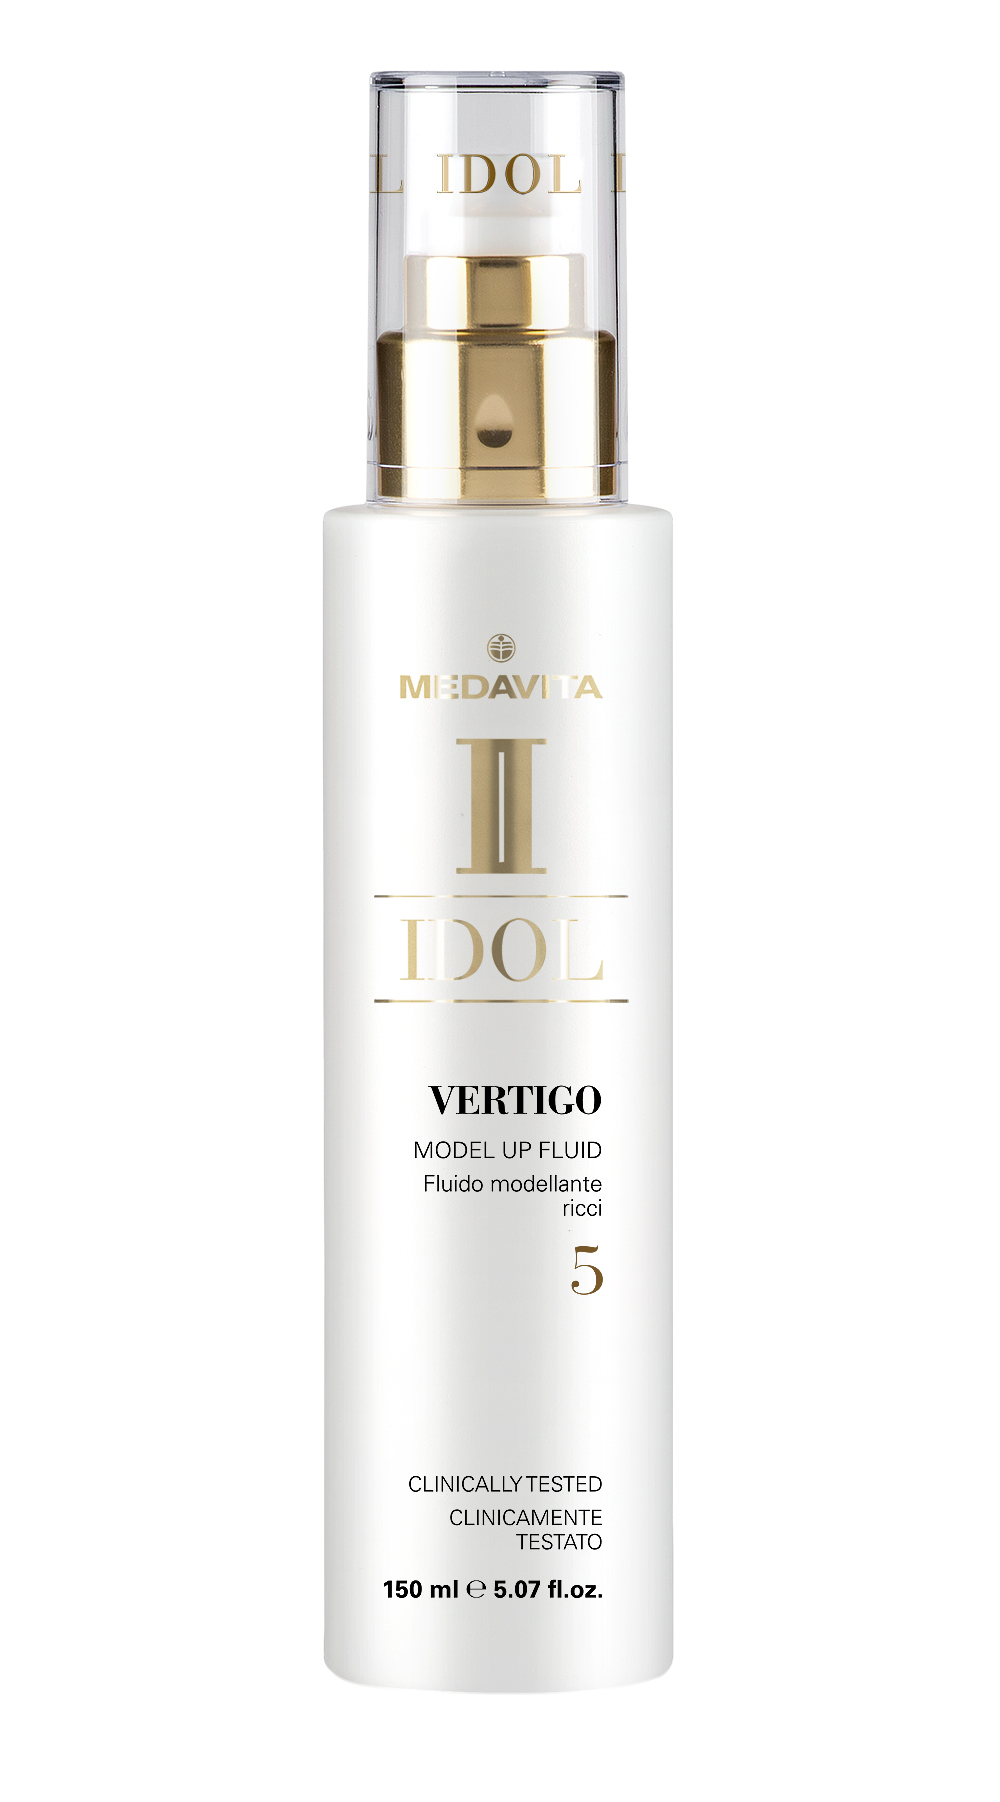 Vertigo IDOL 150ml-klein